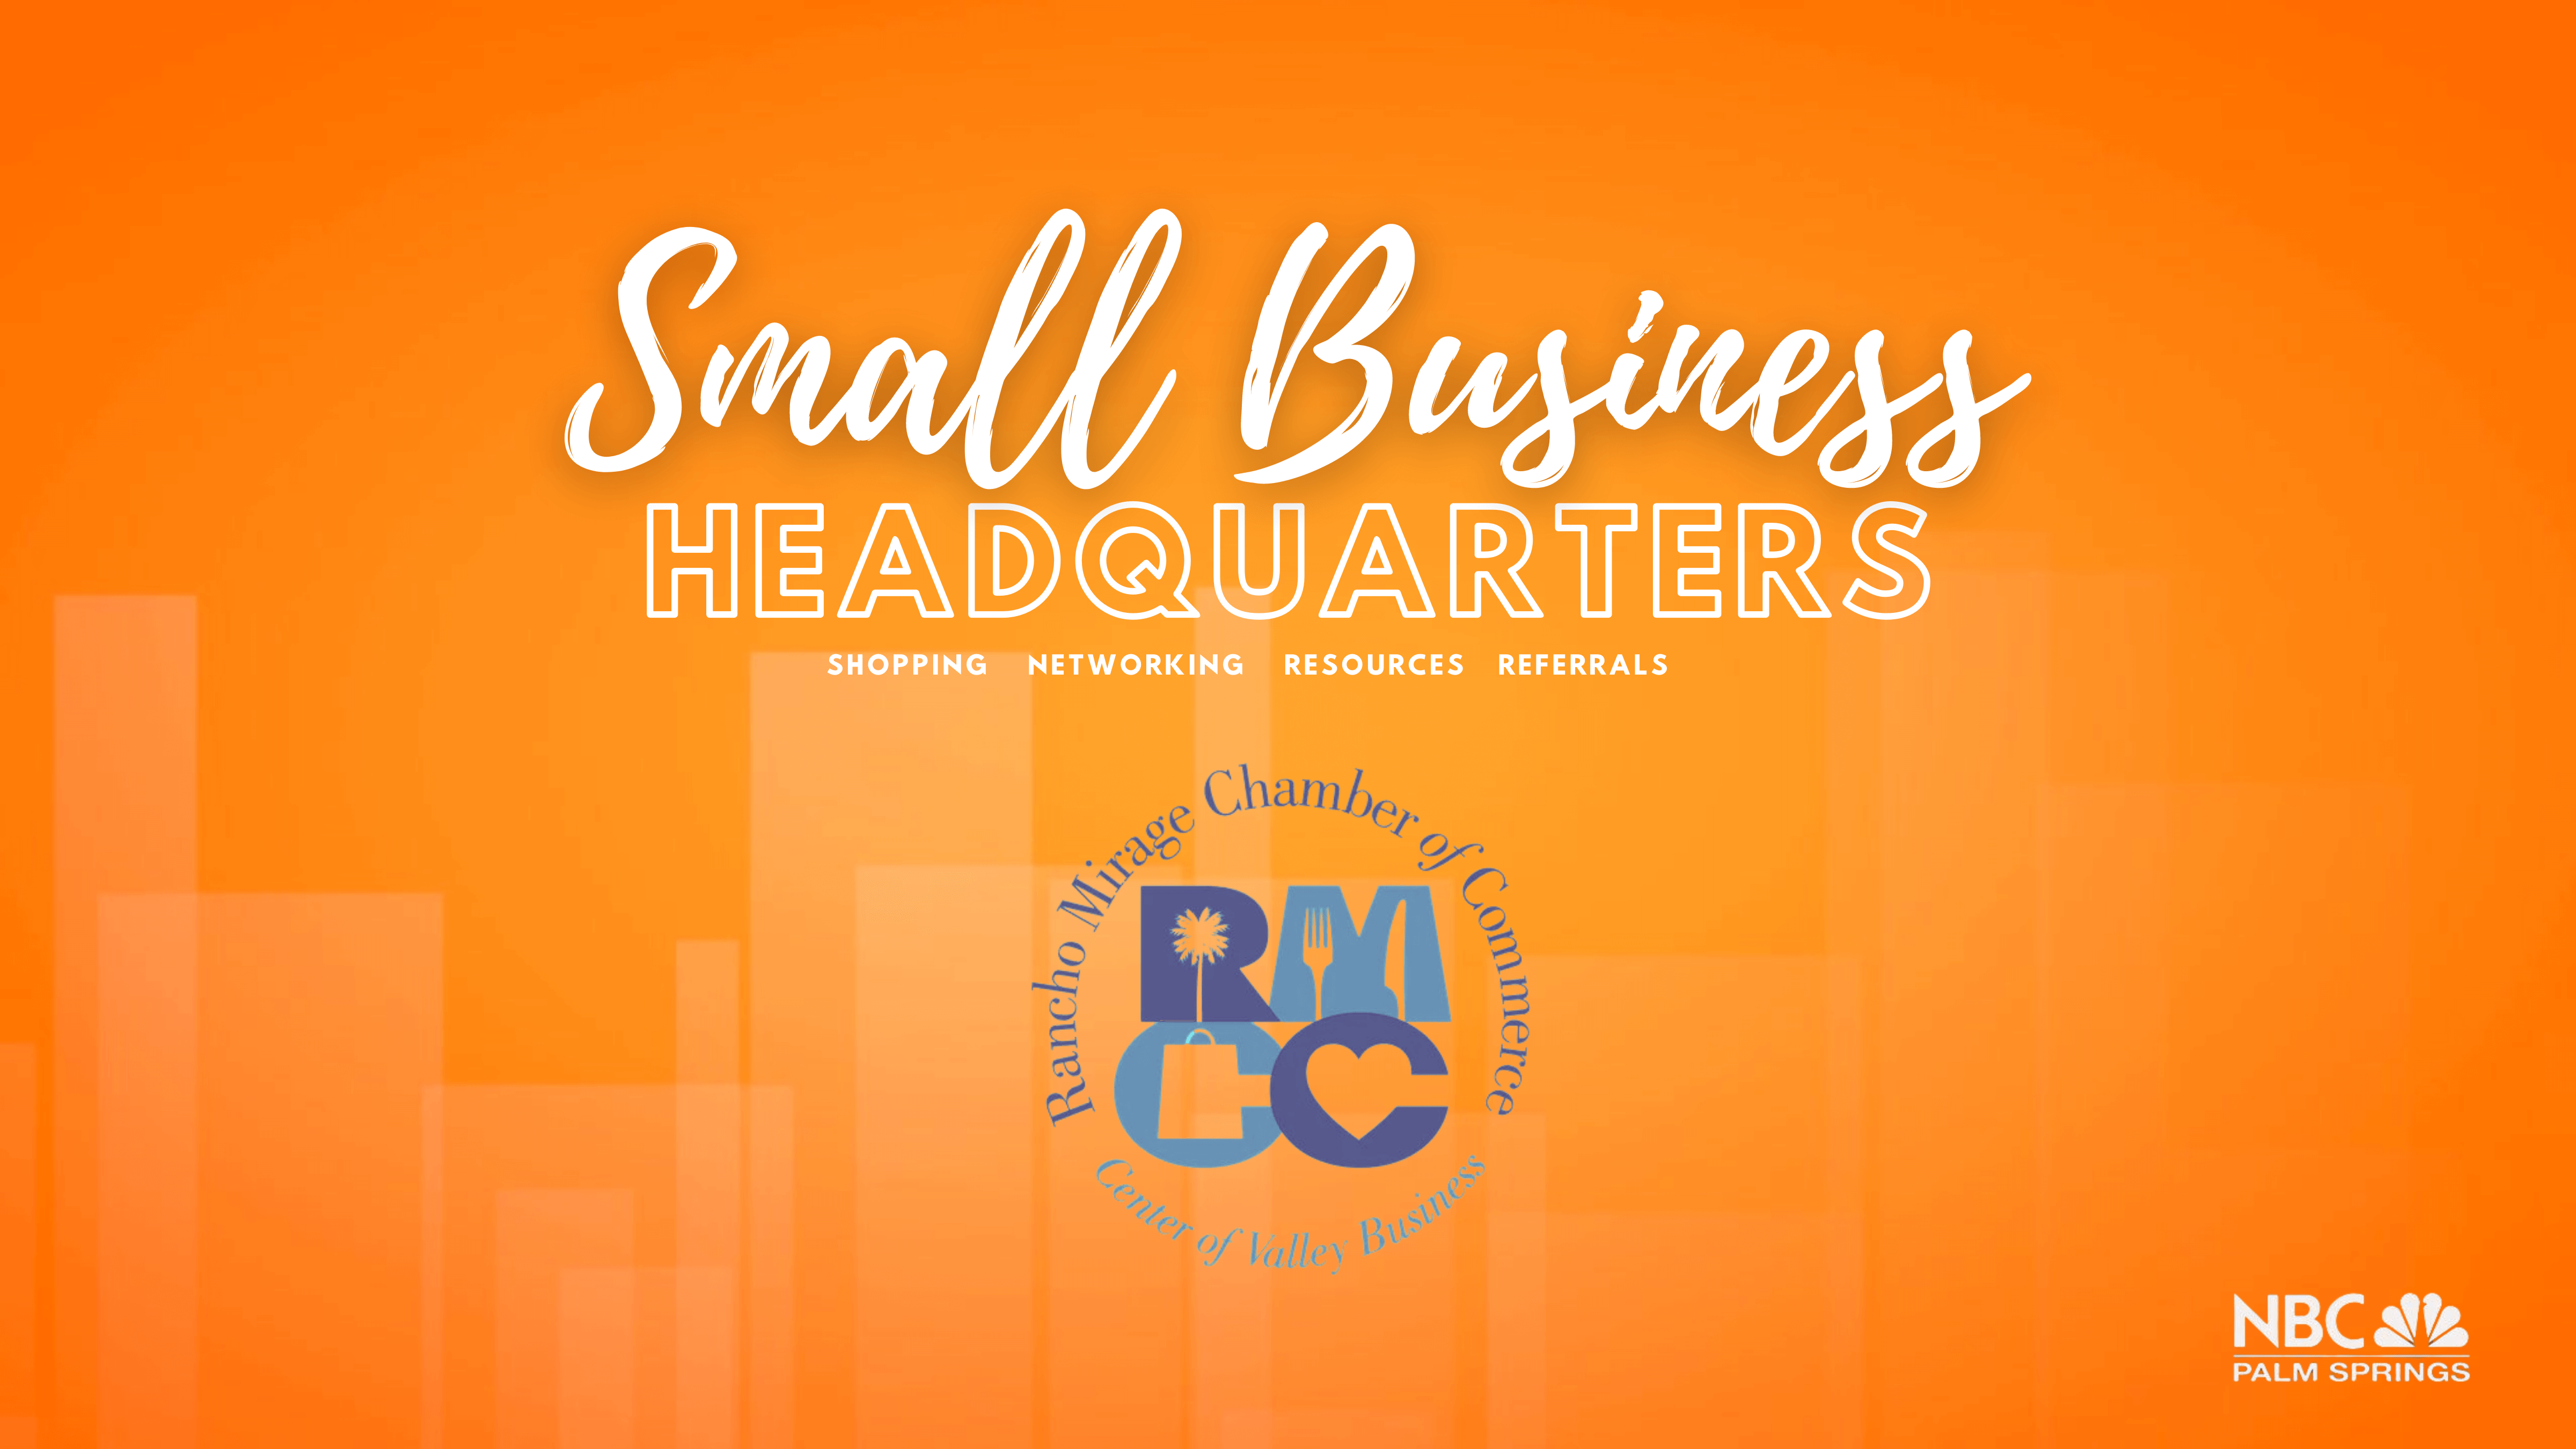 Rancho Mirage Chamber Of Commerce slideshow image